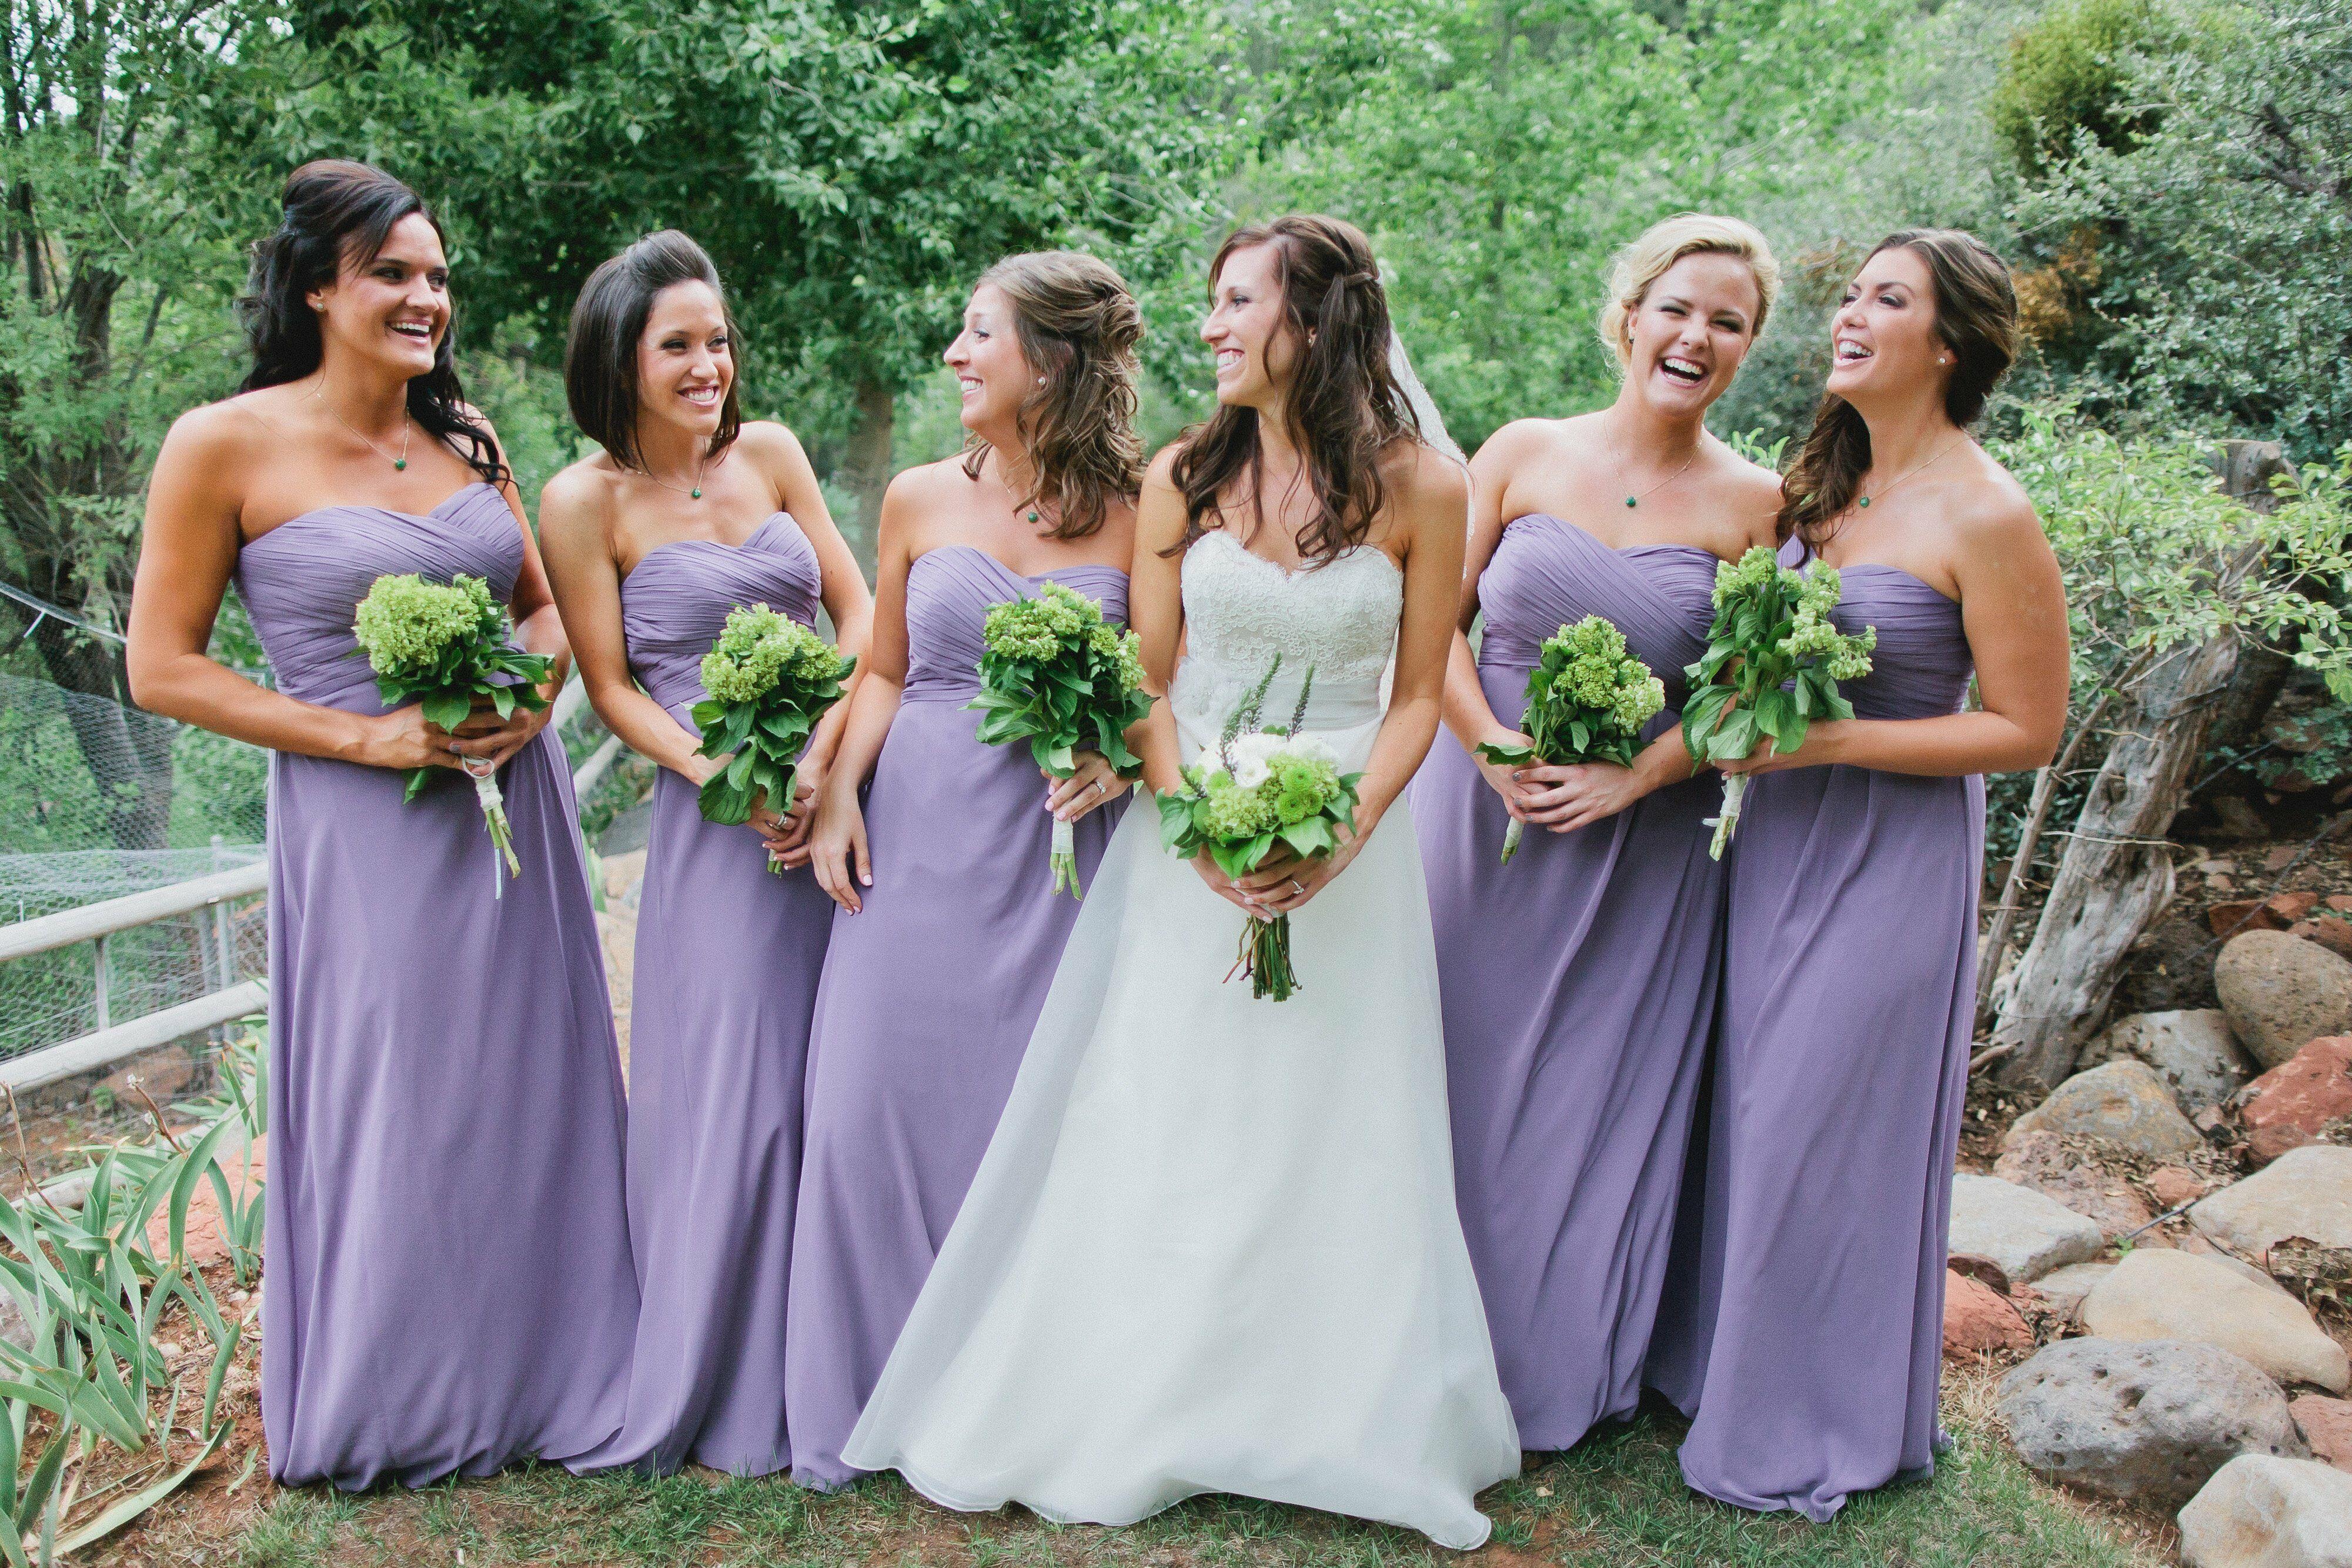 lilac bridesmaid and groom - HD4000×2667